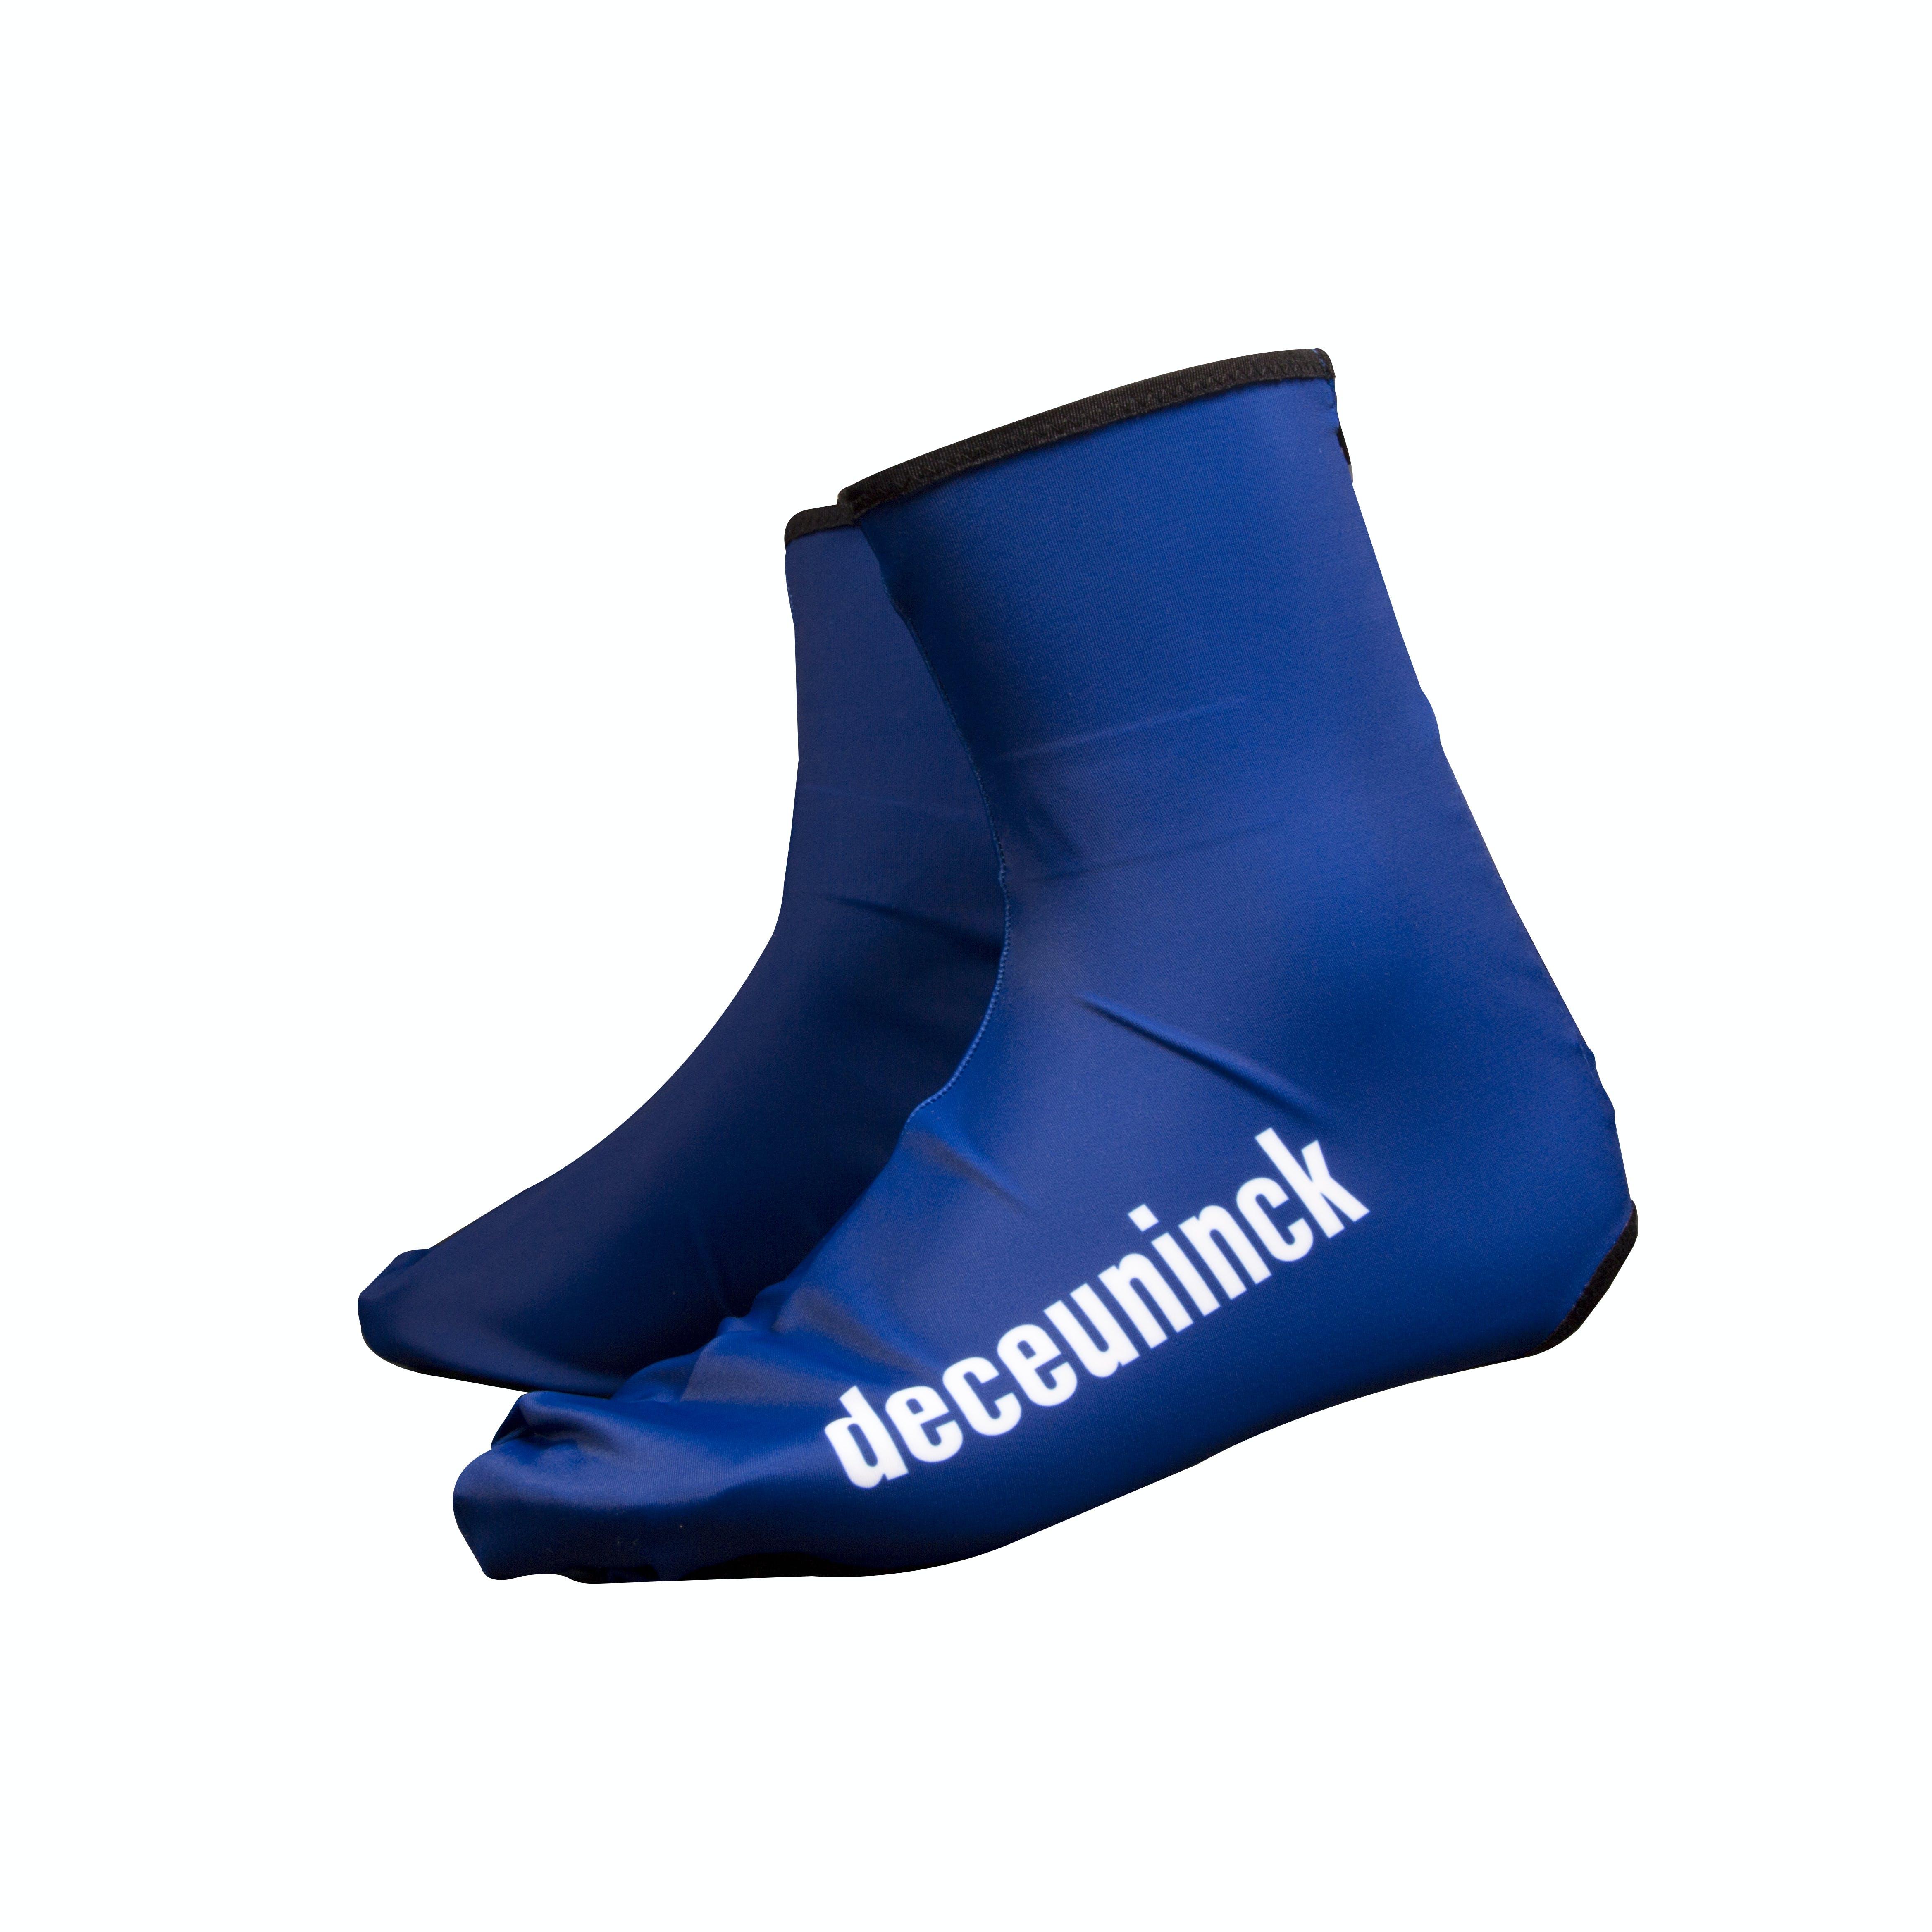 Deceuninck Quick-Step Schoenovertrek Lycra